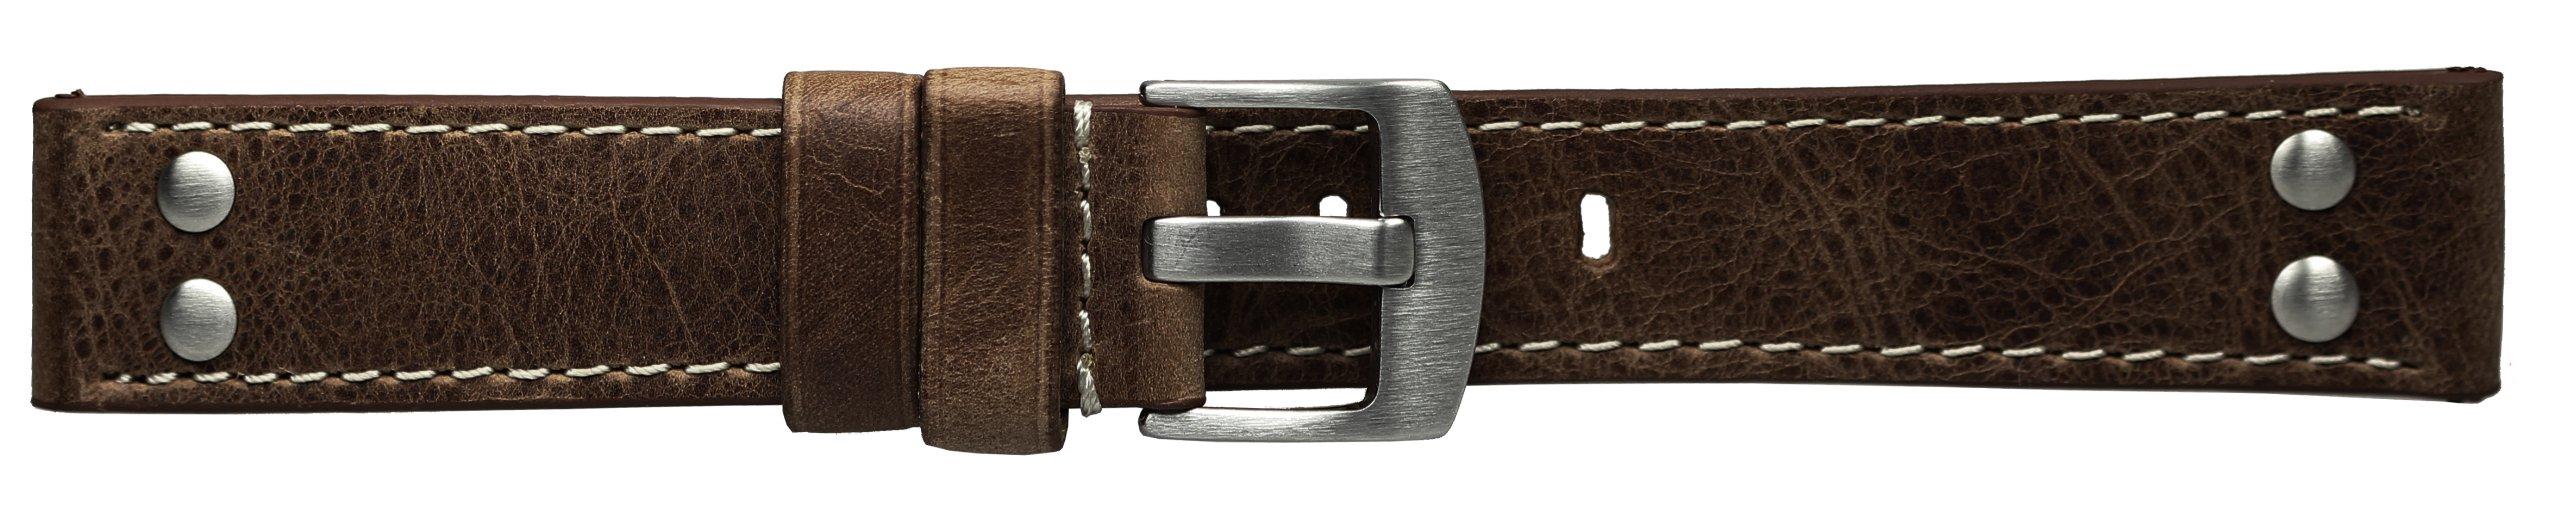 22mm-Dunkelbraunes-Uhrenarmband-Lederarmband-M41-Fliegerarmband-im-Vintage-Stil-weie-Steppnaht-Edelstahl-Doppelnieten